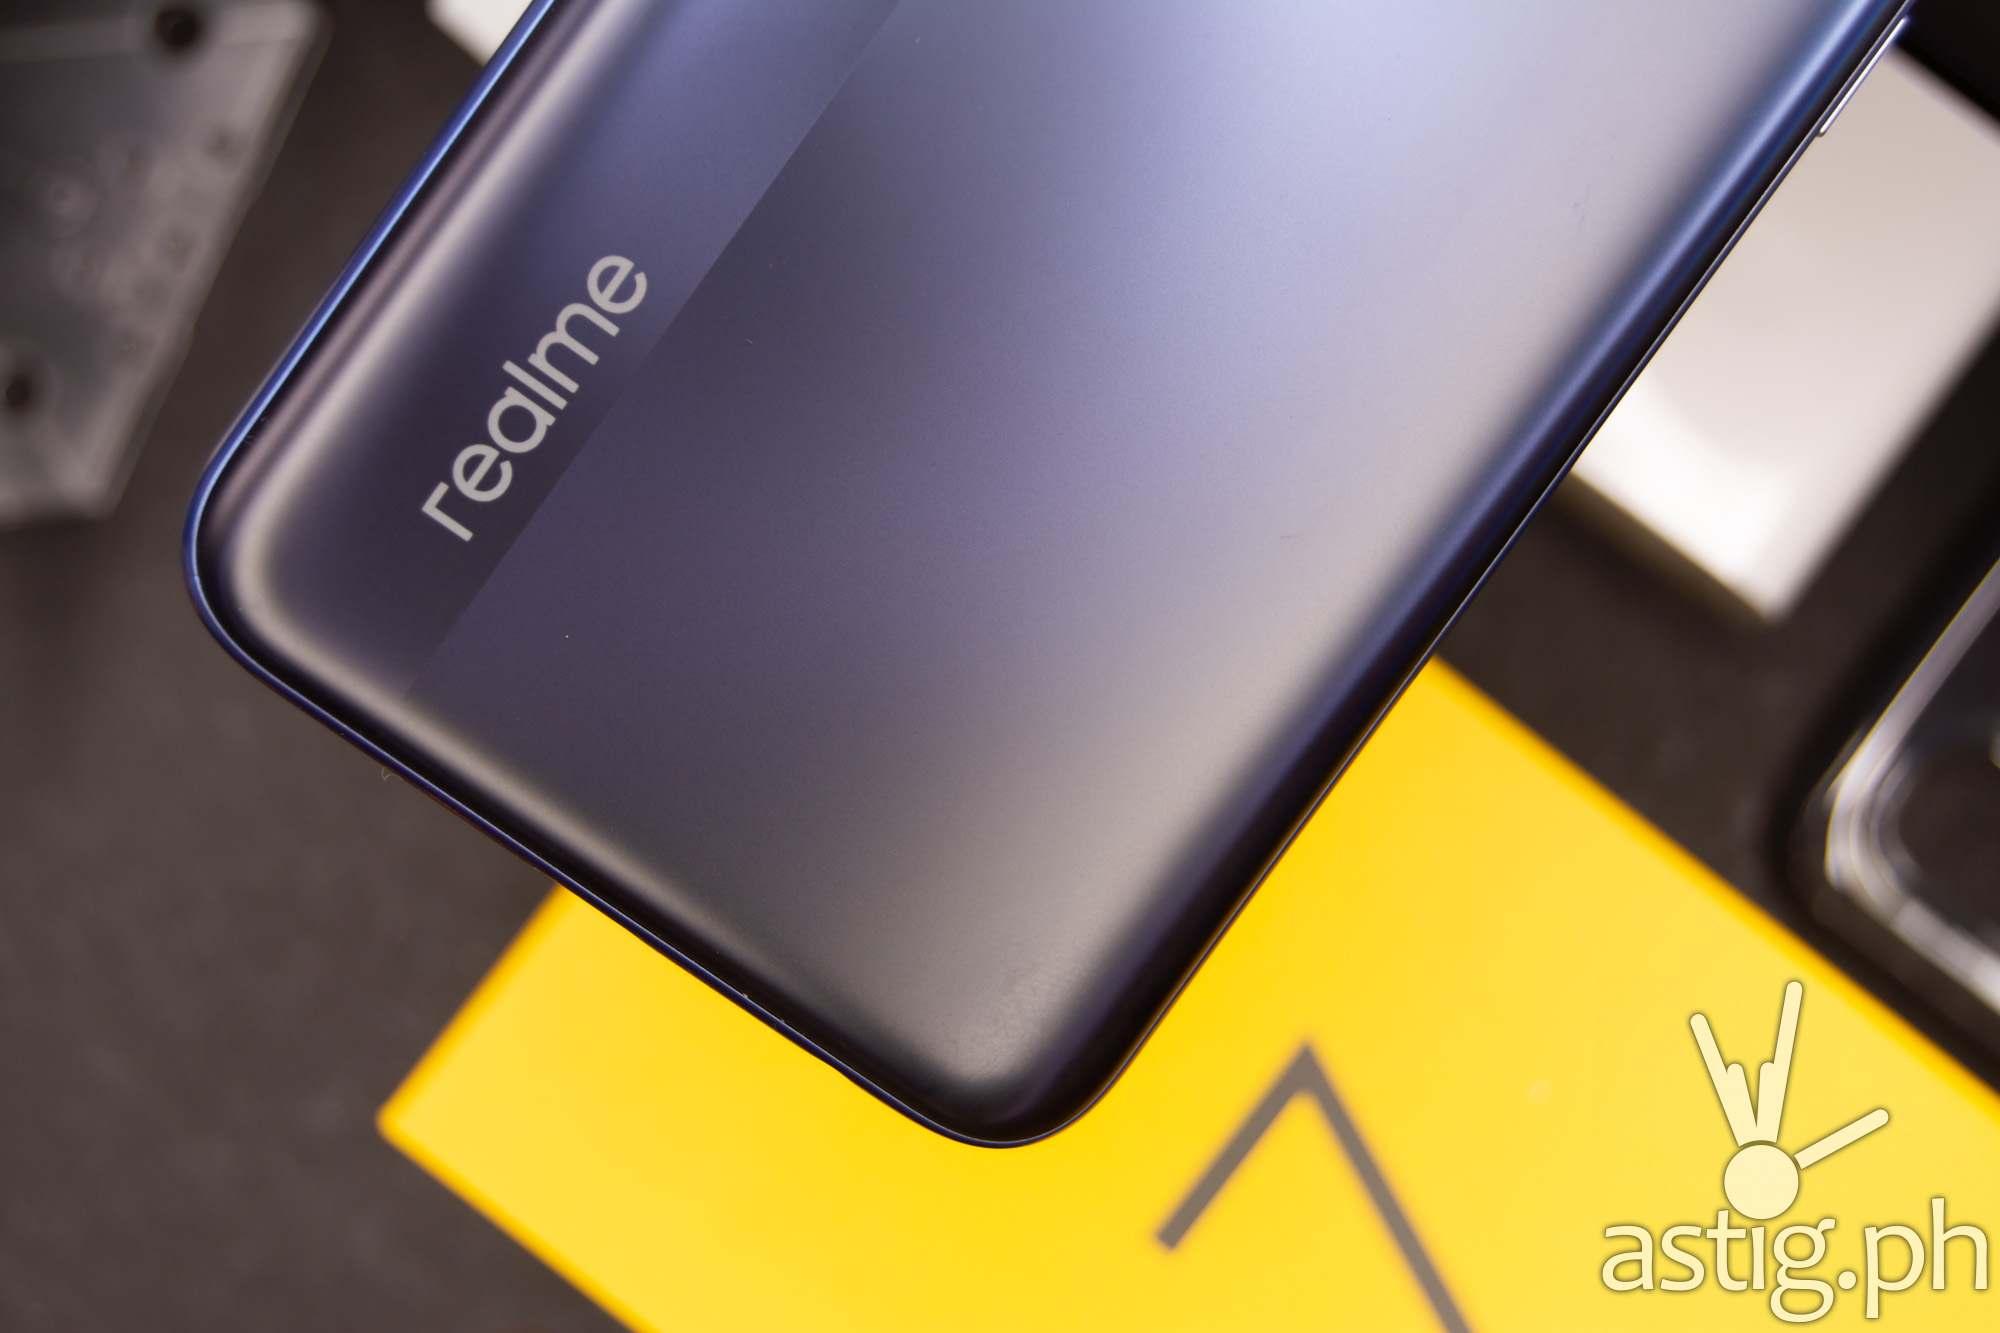 realme logo - realme 7 (Philippines)